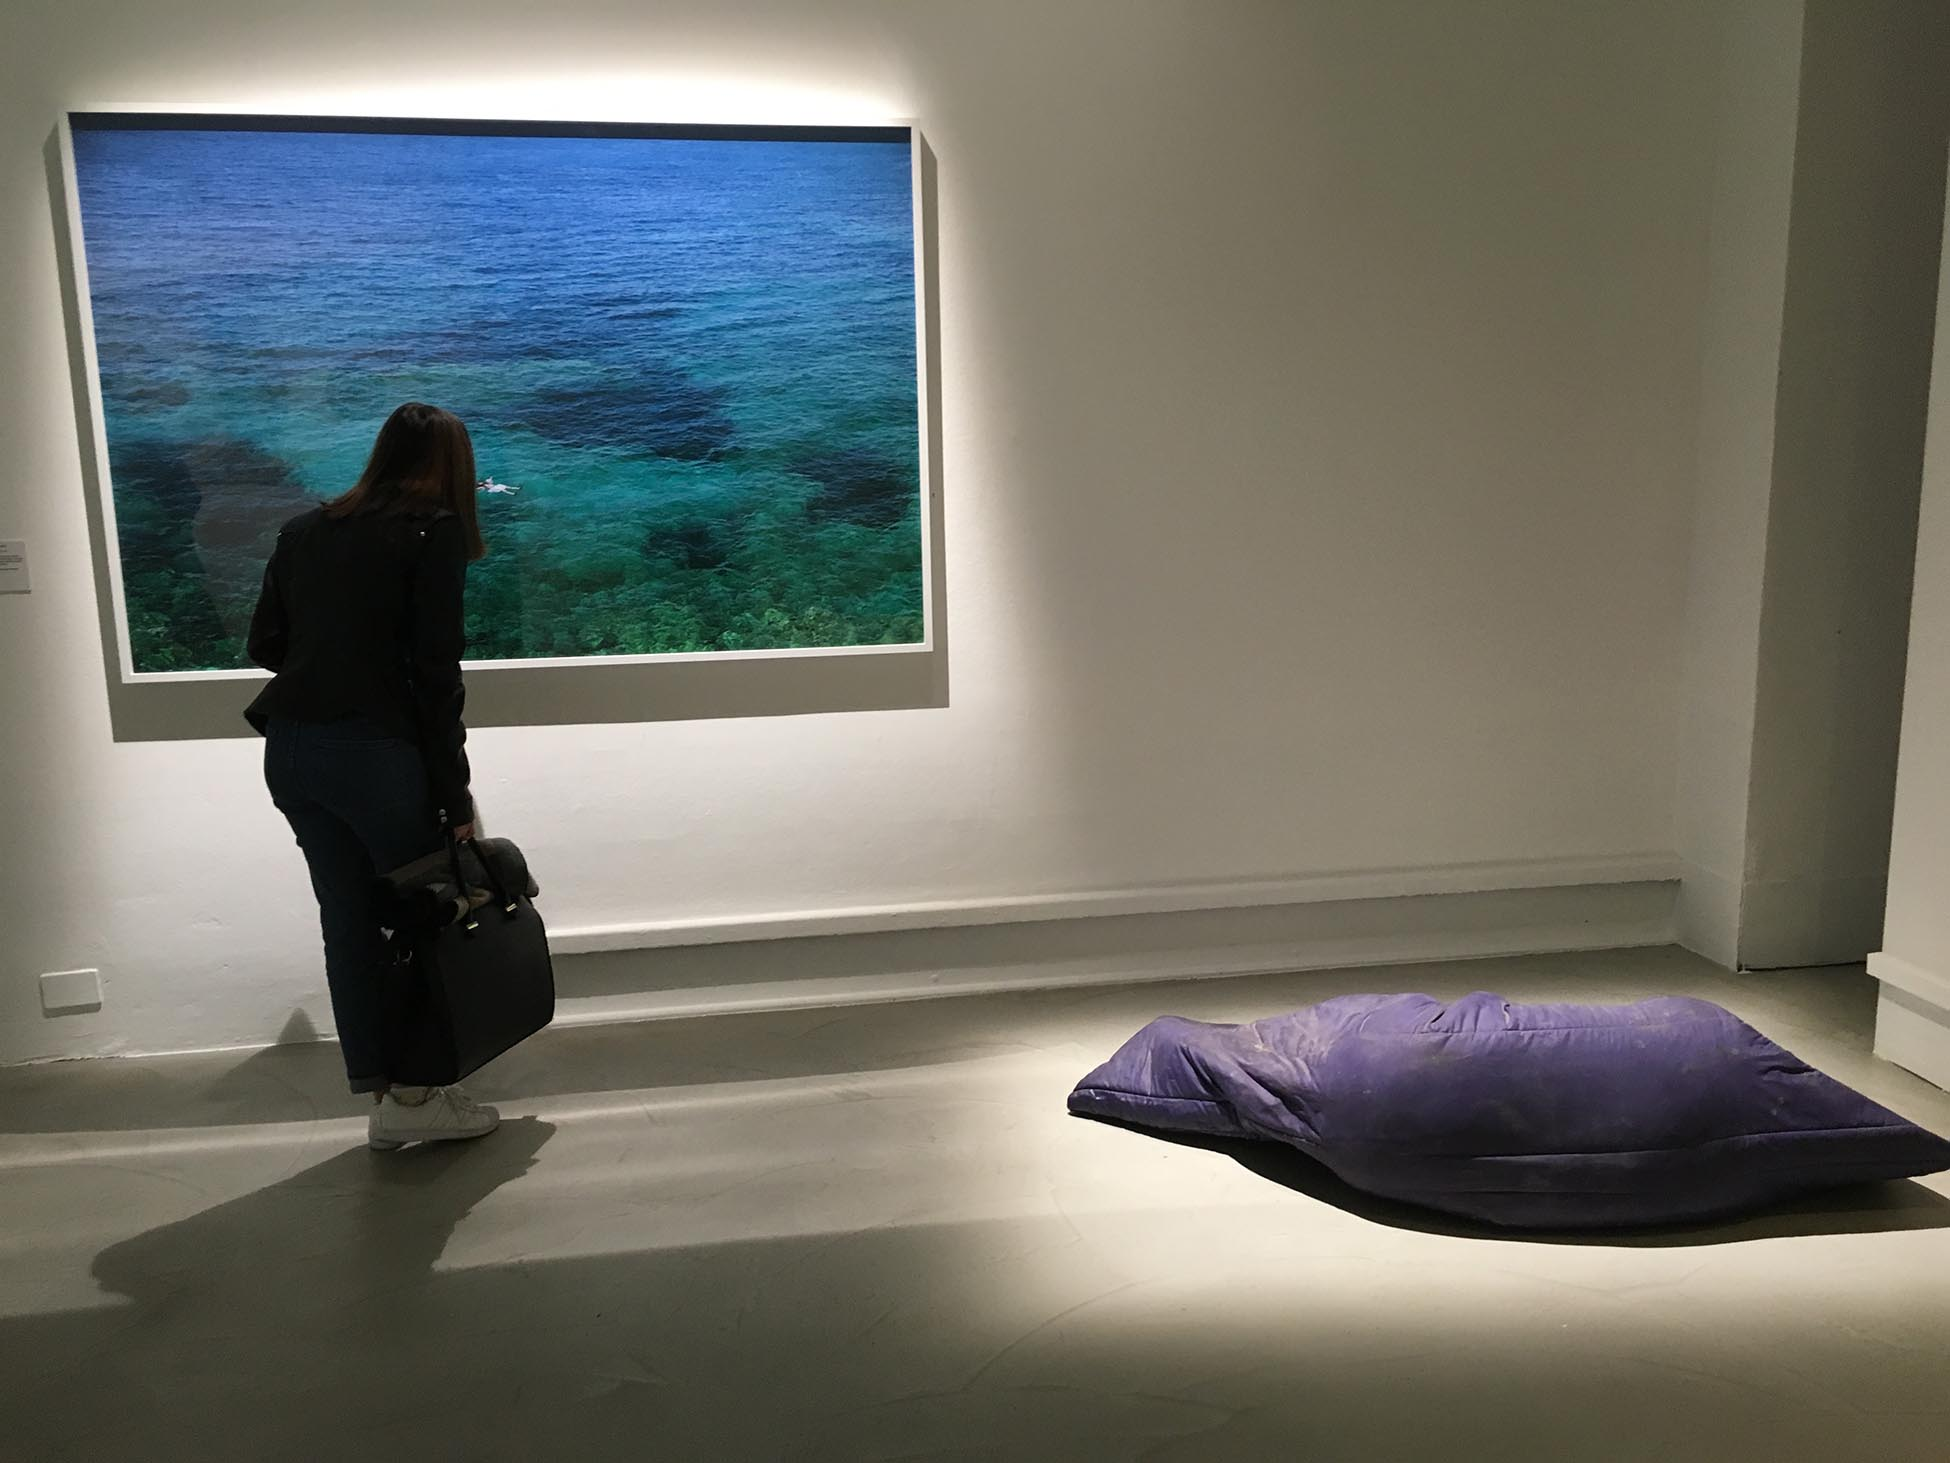 Panos Kokkinias, Yiorgis, 2011 (Courtesy Xippas Galleries iny PKO 0116); Gavin Turk, Nomad, 2003 (Courtesy Ella Acdan & Darya Collection) (Foto: Barbara Fässler)